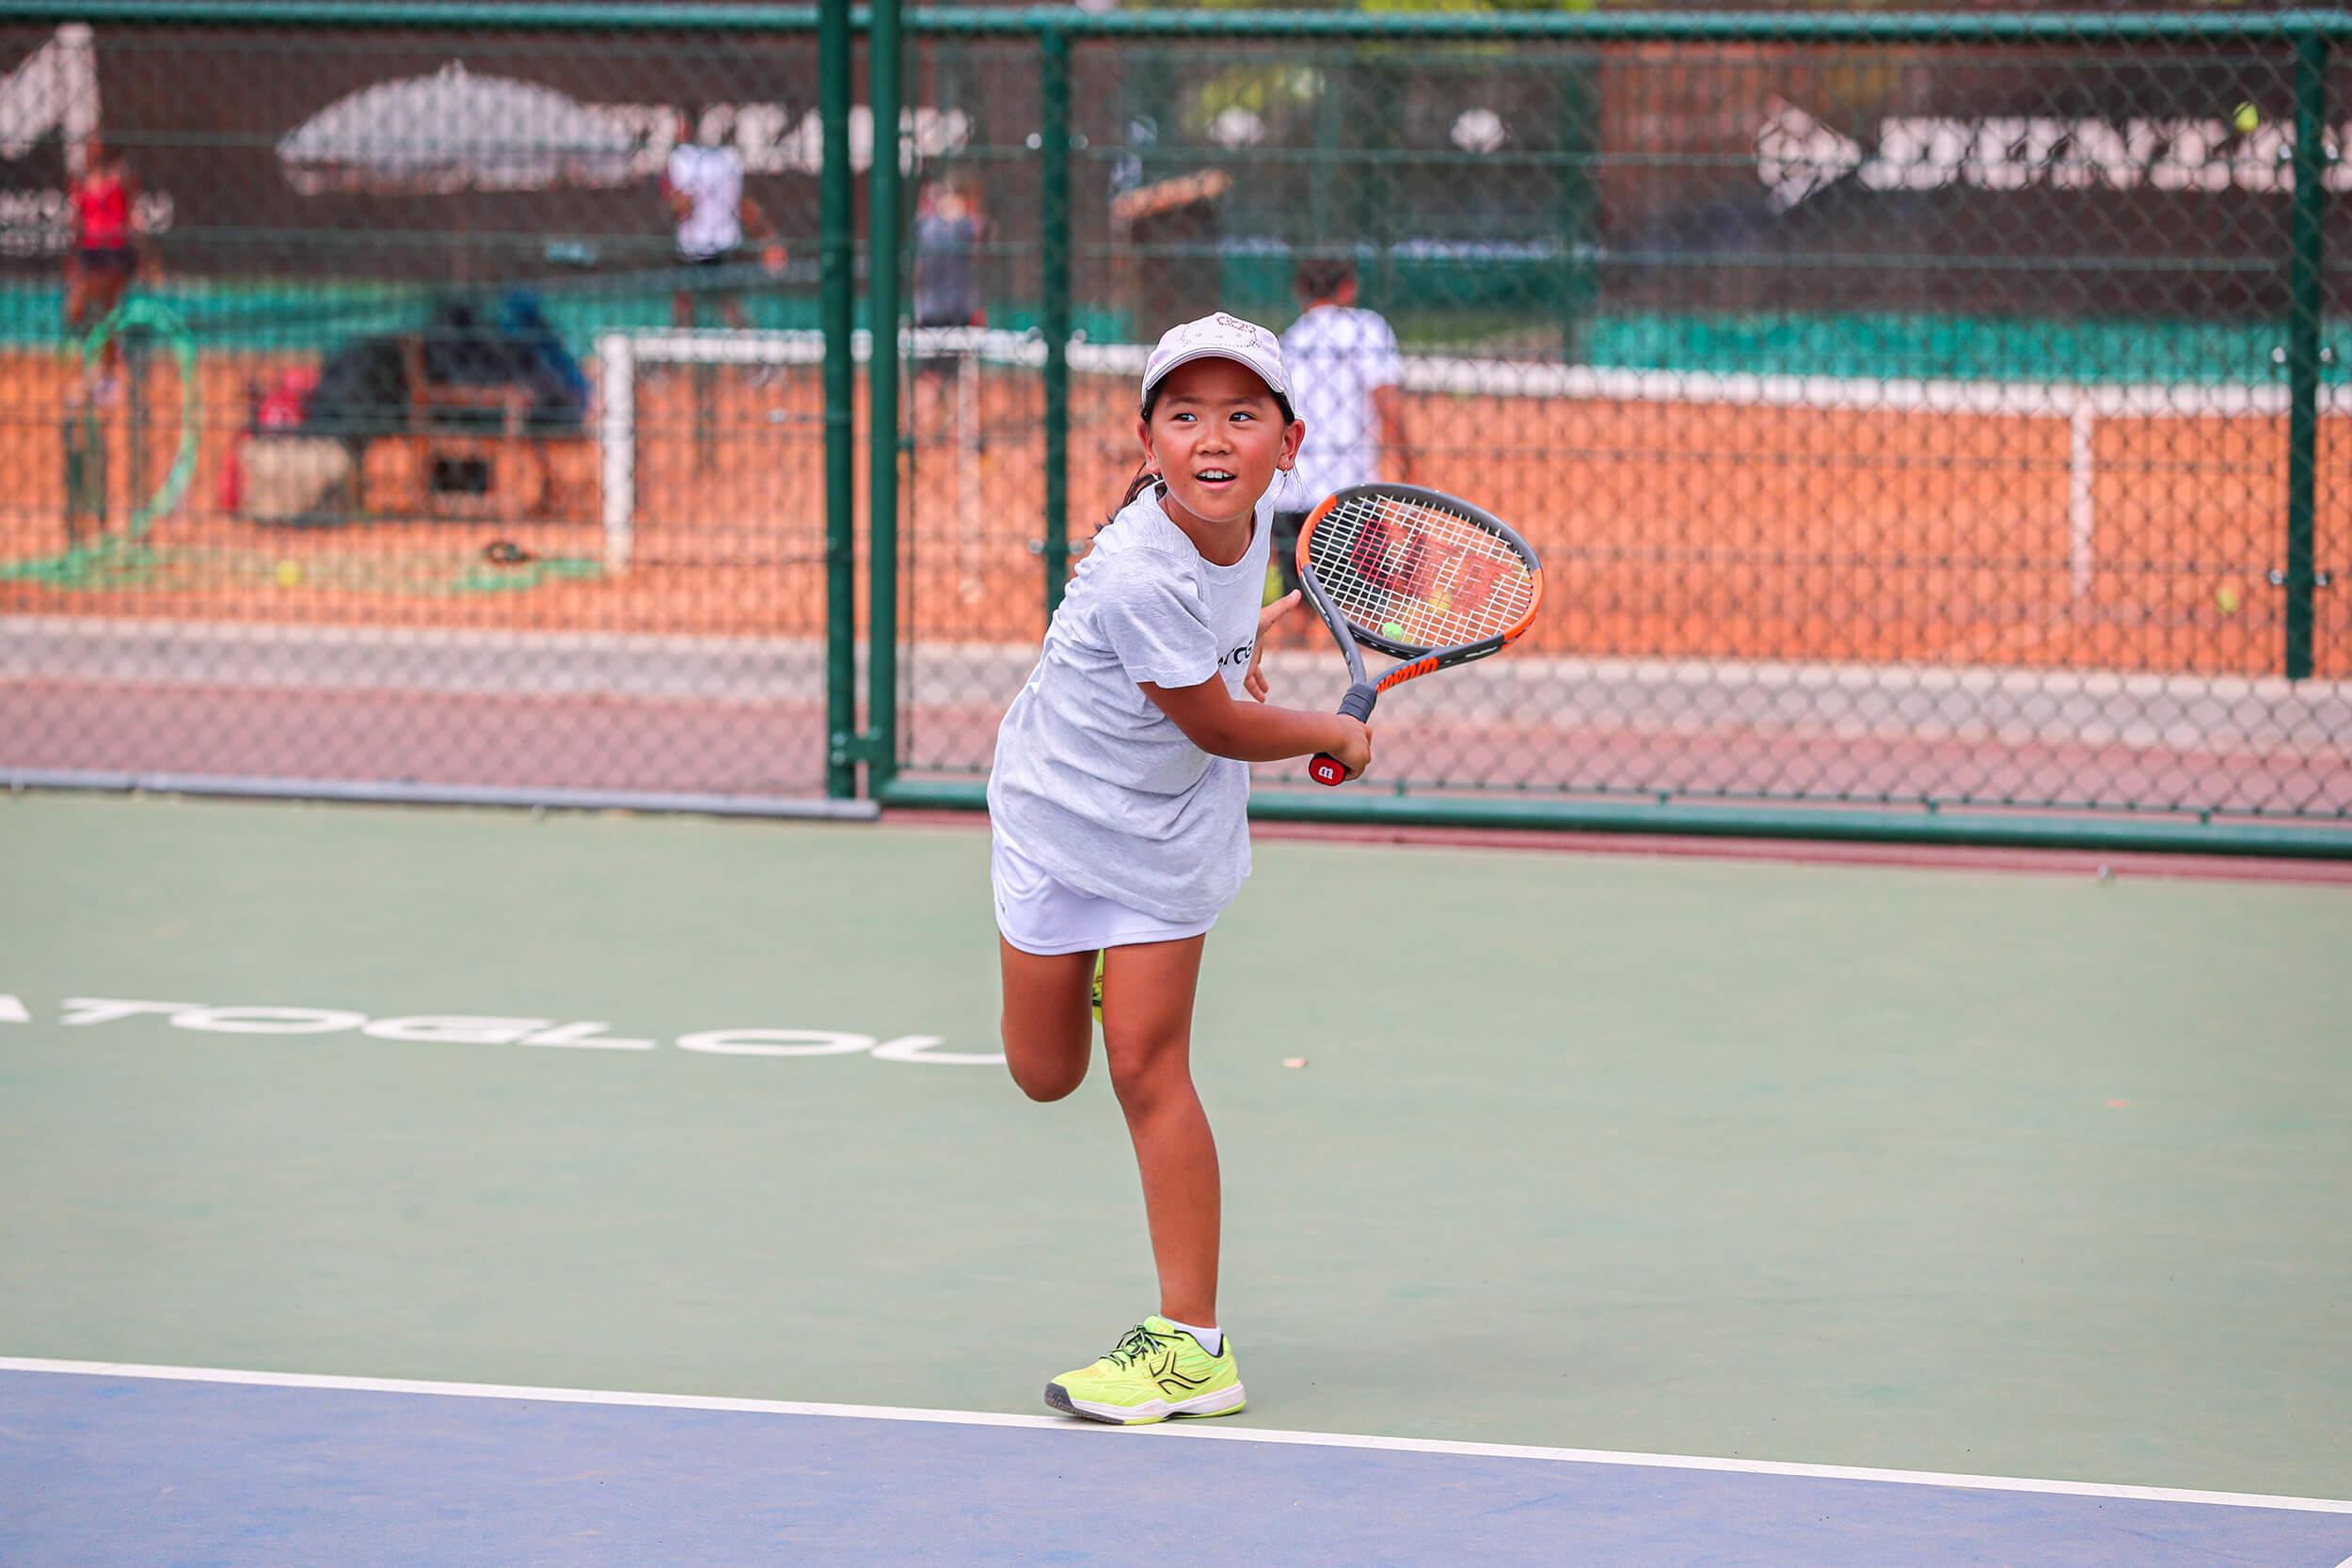 tennis-enfant